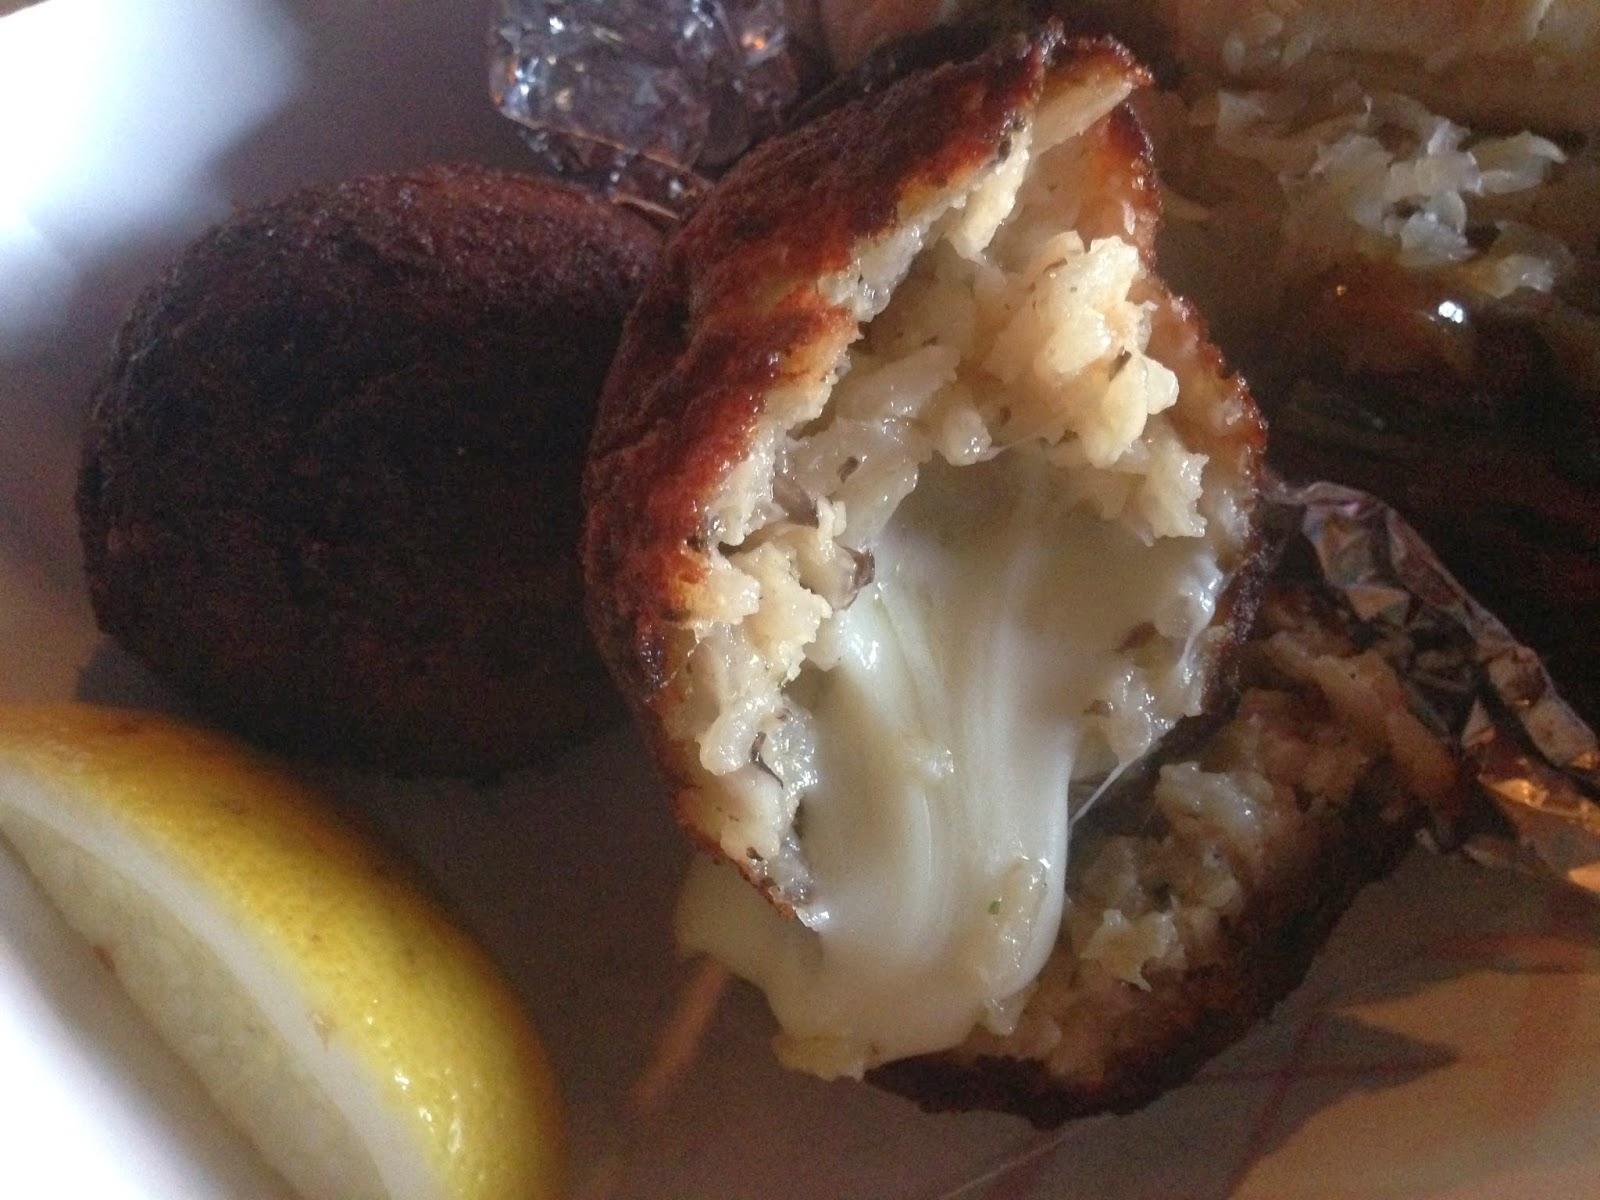 Way Good Serva-Teria Food Truck, Houston TX - Fried Risotto Balls